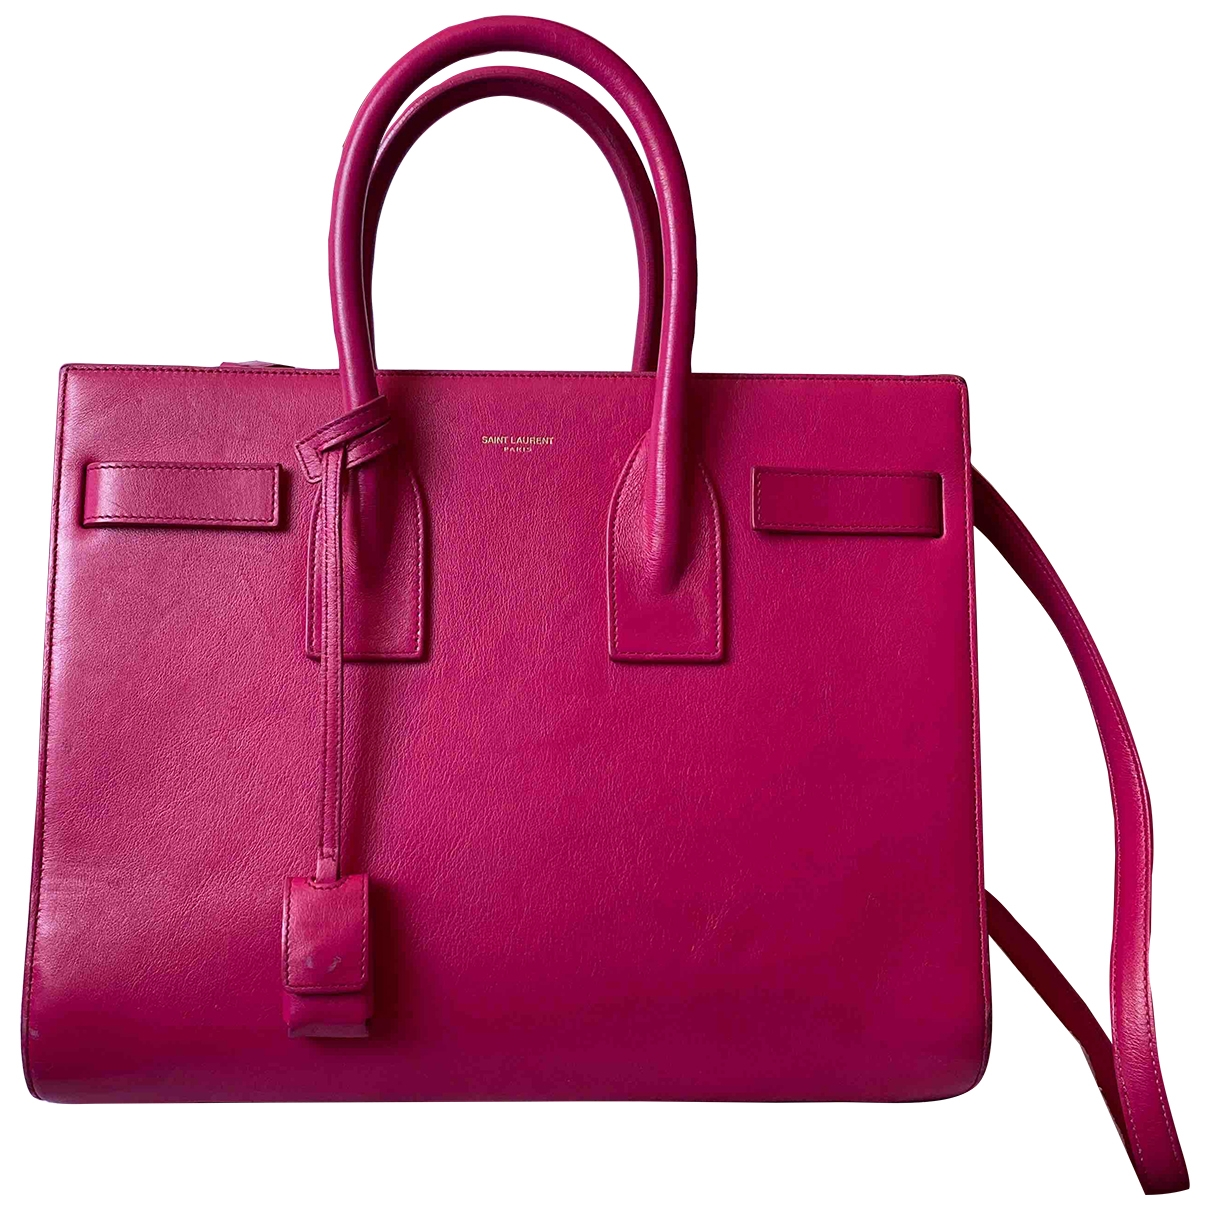 Saint Laurent Sac de Jour Pink Leather handbag for Women \N